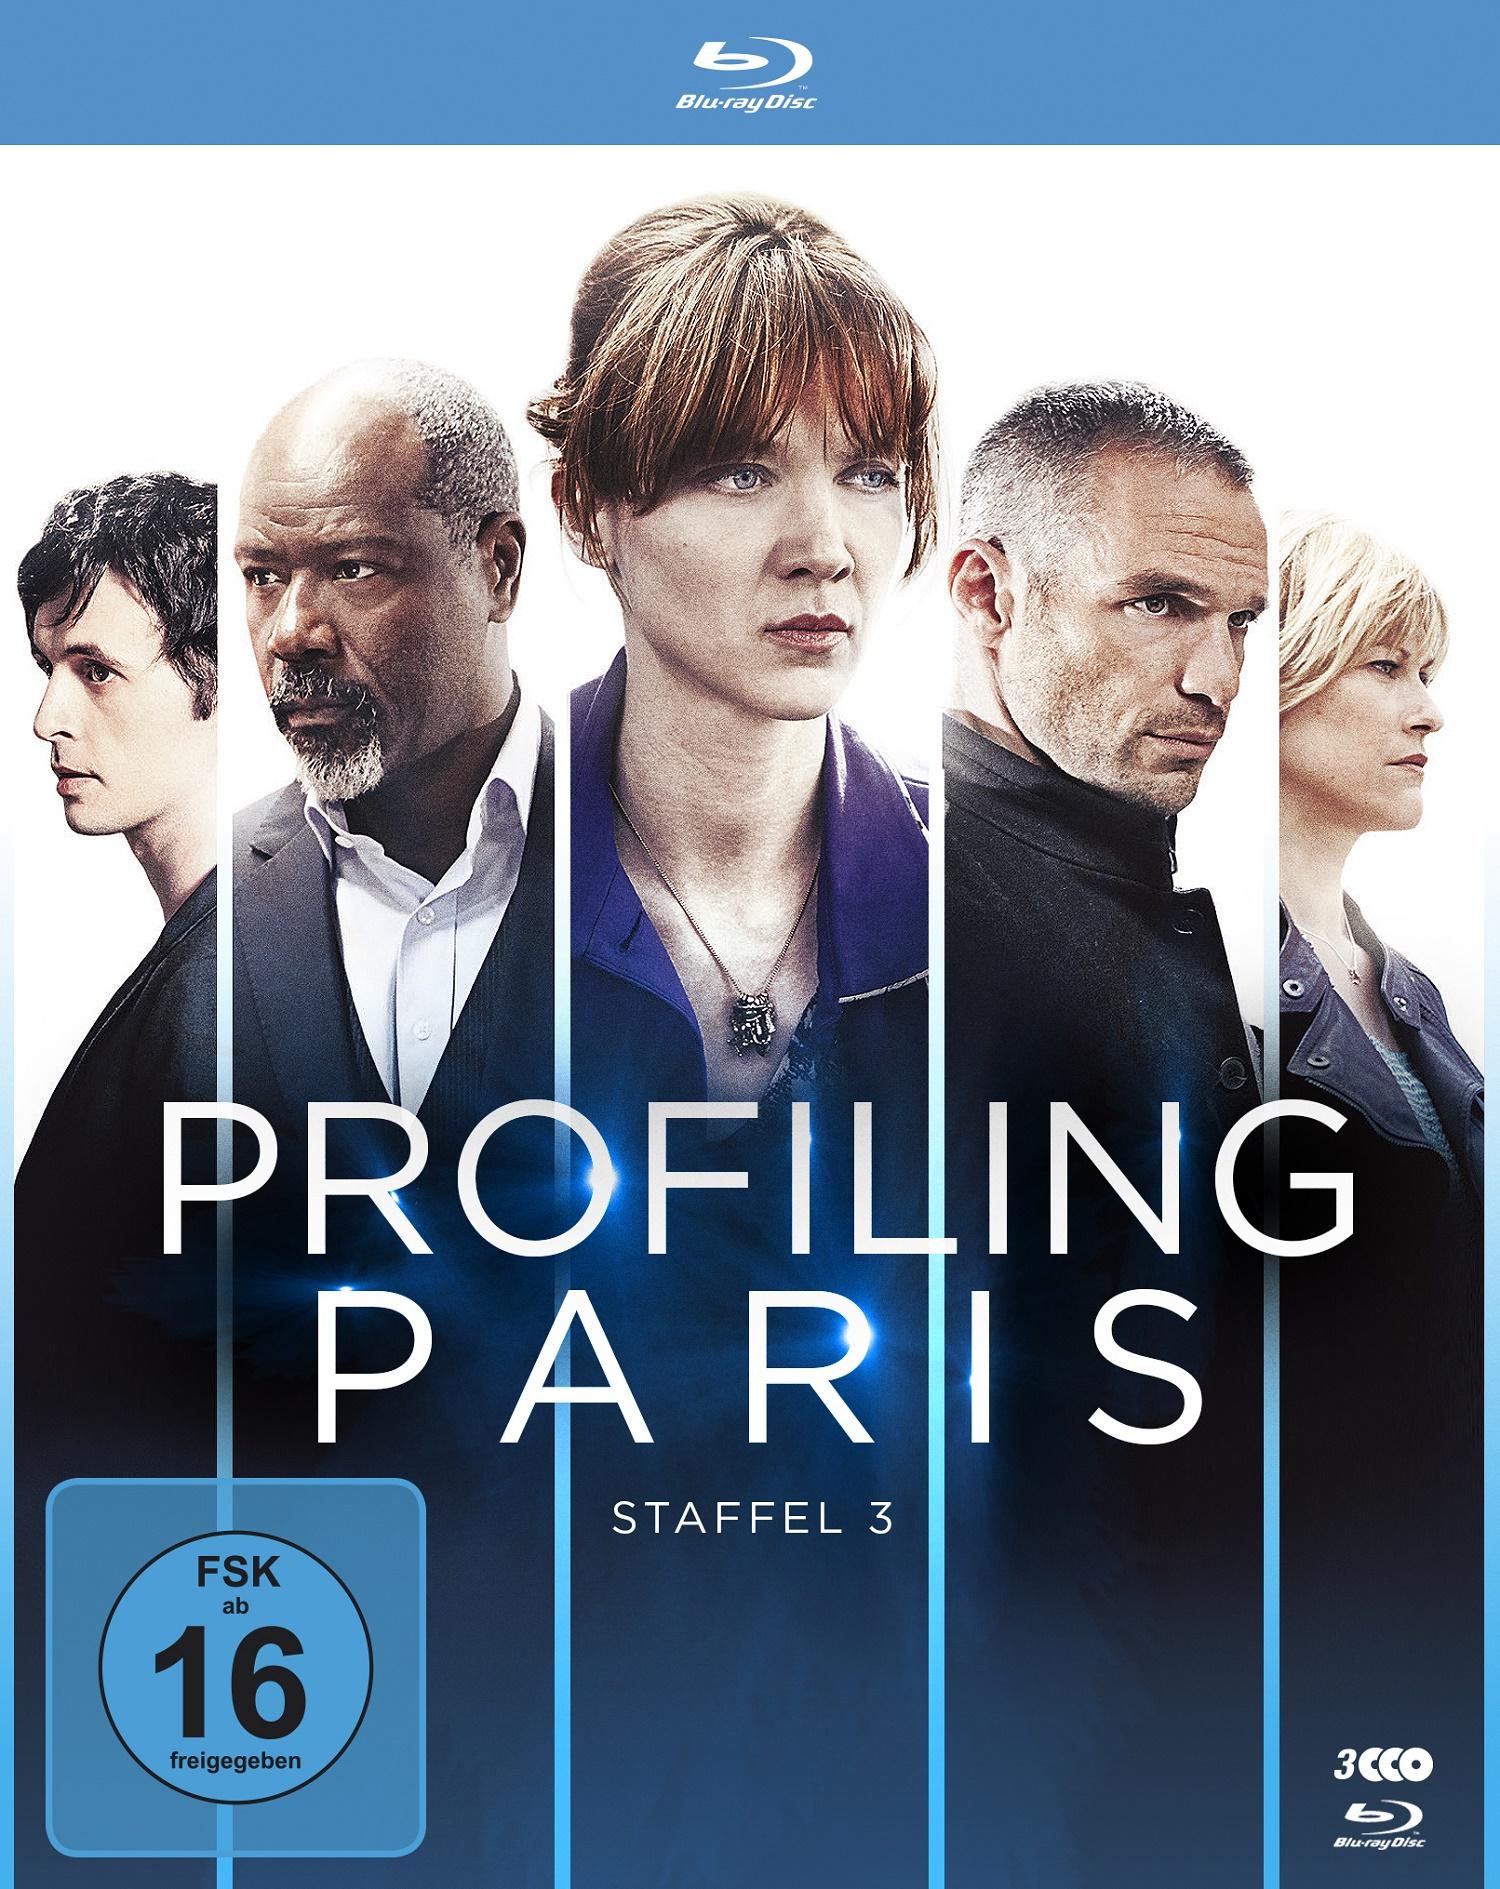 Profiling Paris Staffel 3 Folge 1